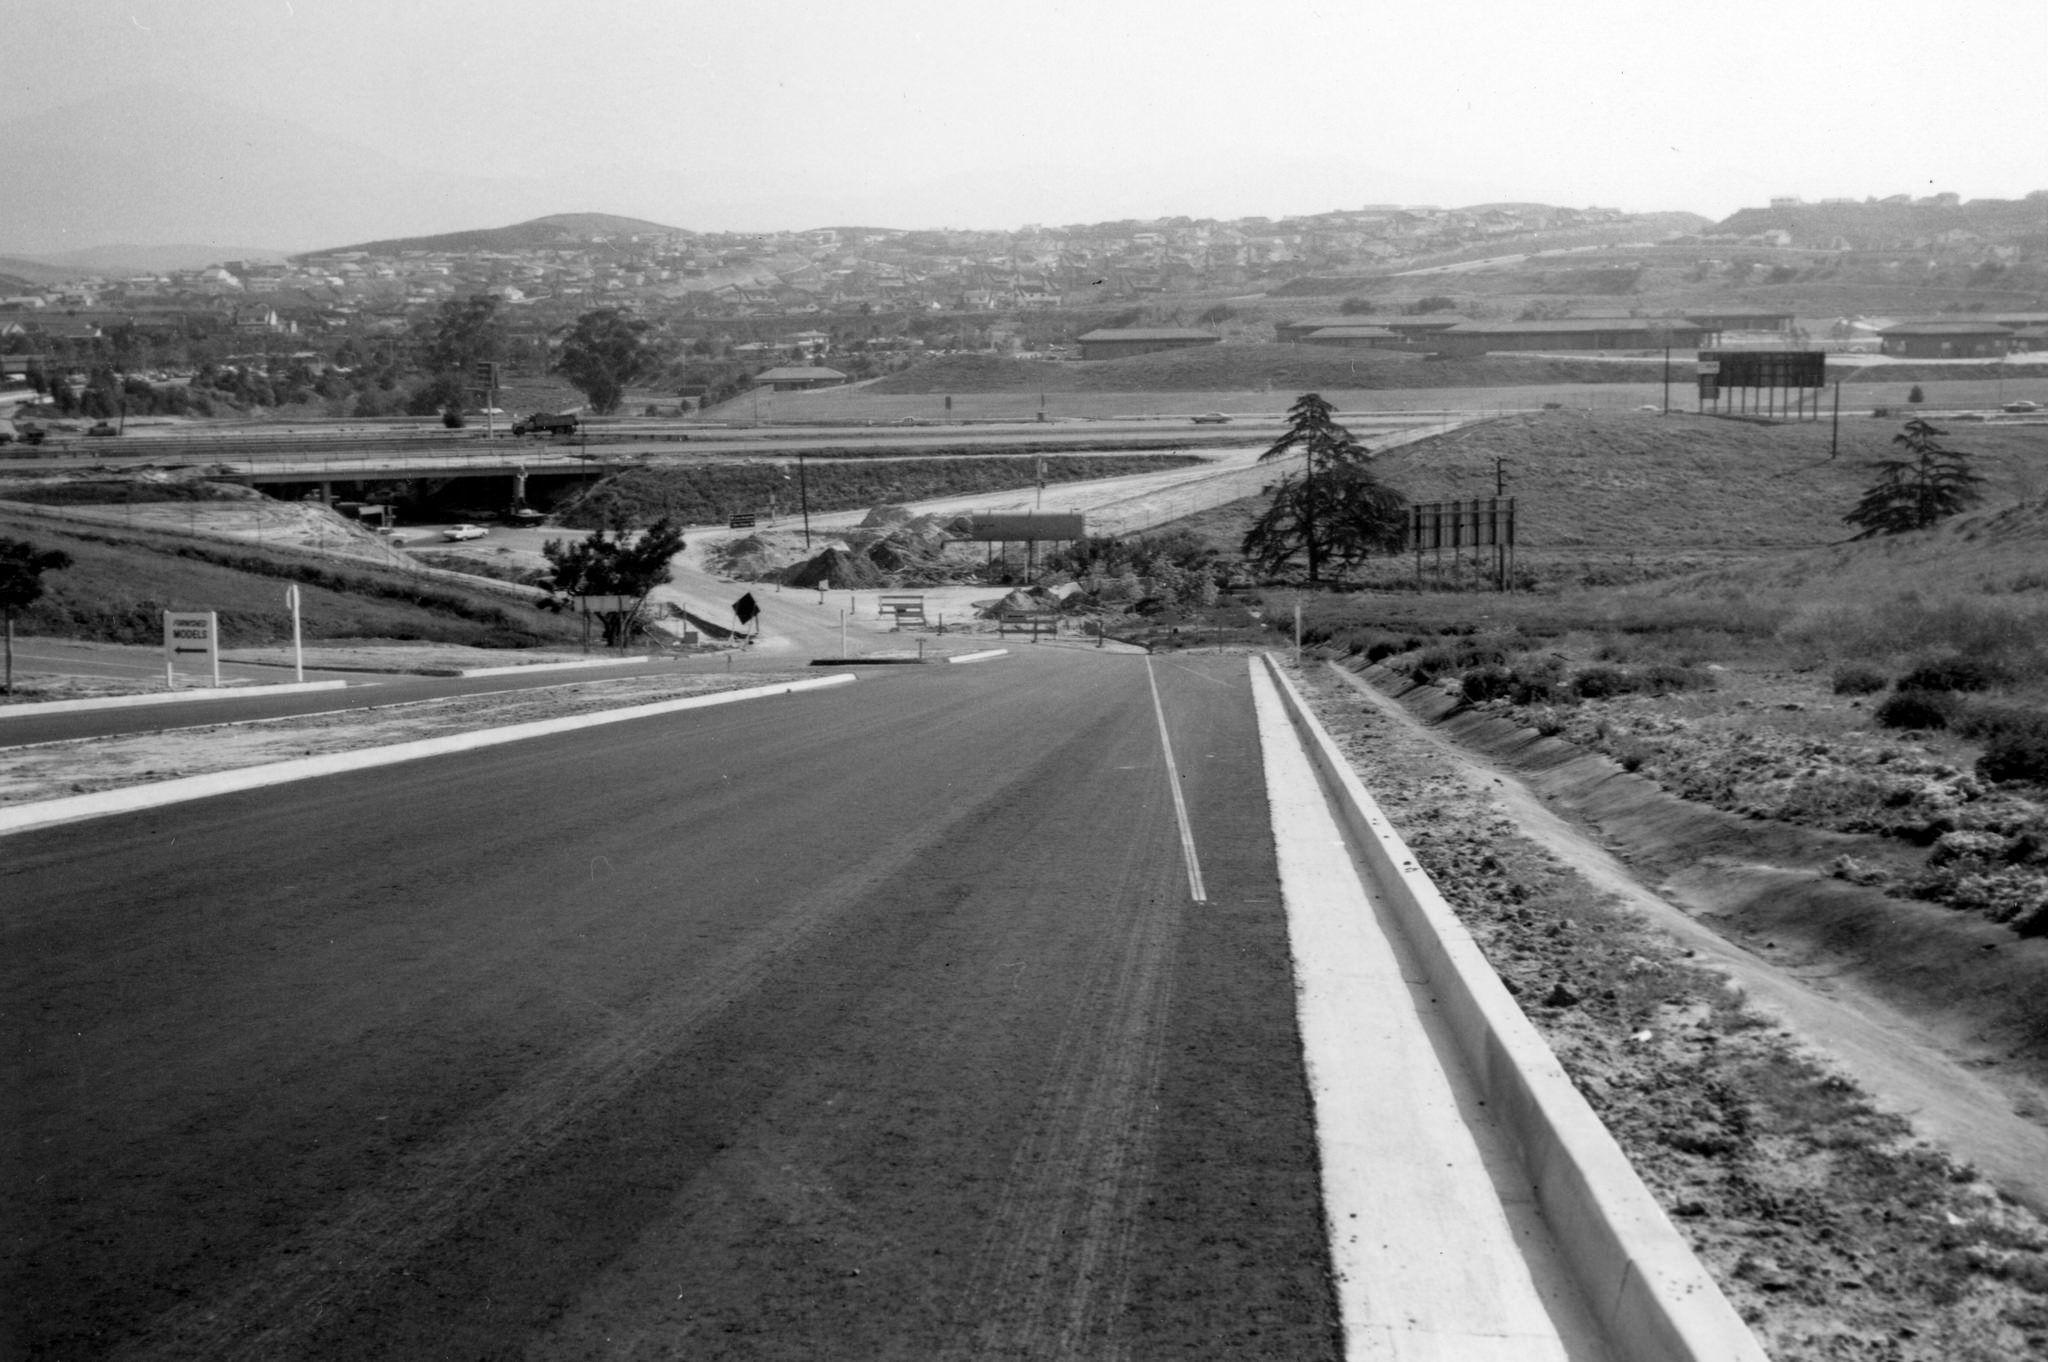 La Paz Road Laguna Hills April 1968 La Paz Laguna Hills San Luis Obispo County